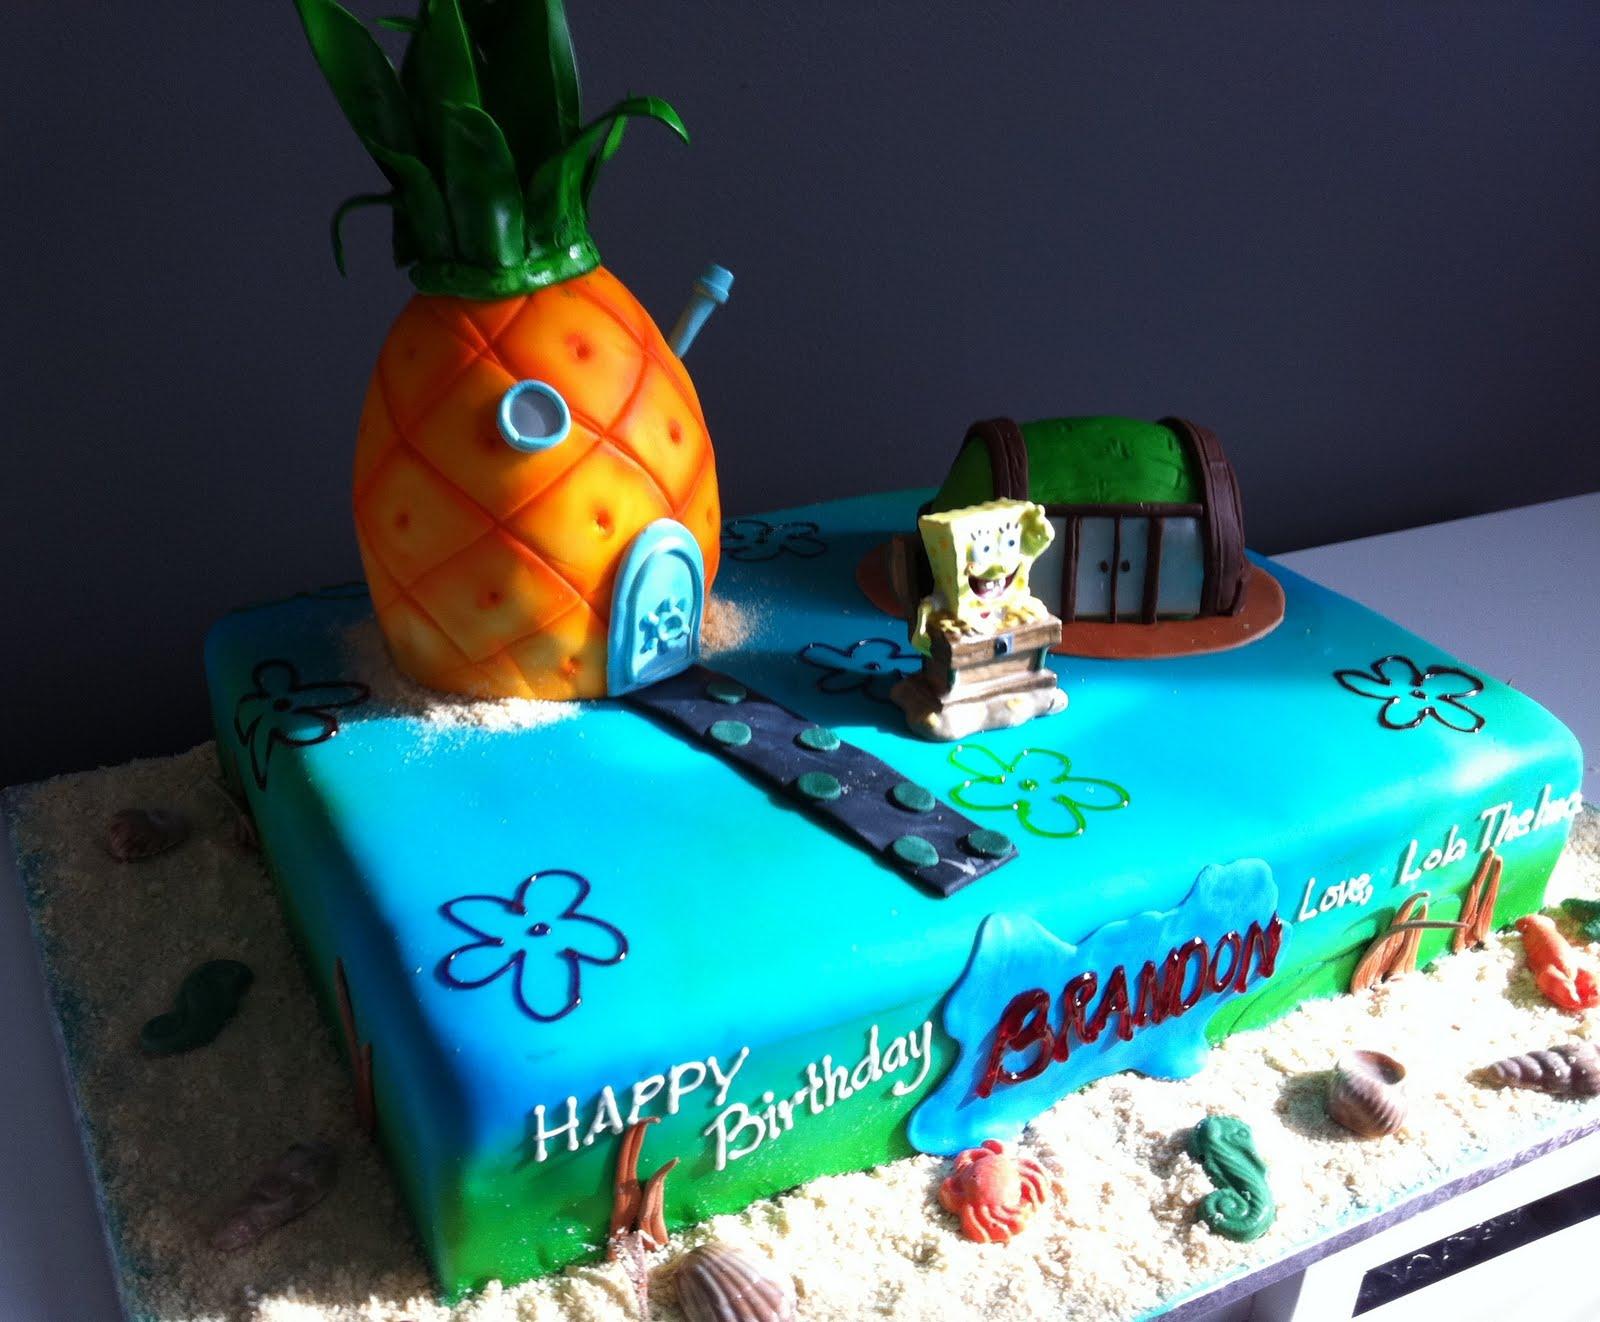 Cake Spongebob Cake Spongbob Squarepants Themed Party Ideas That